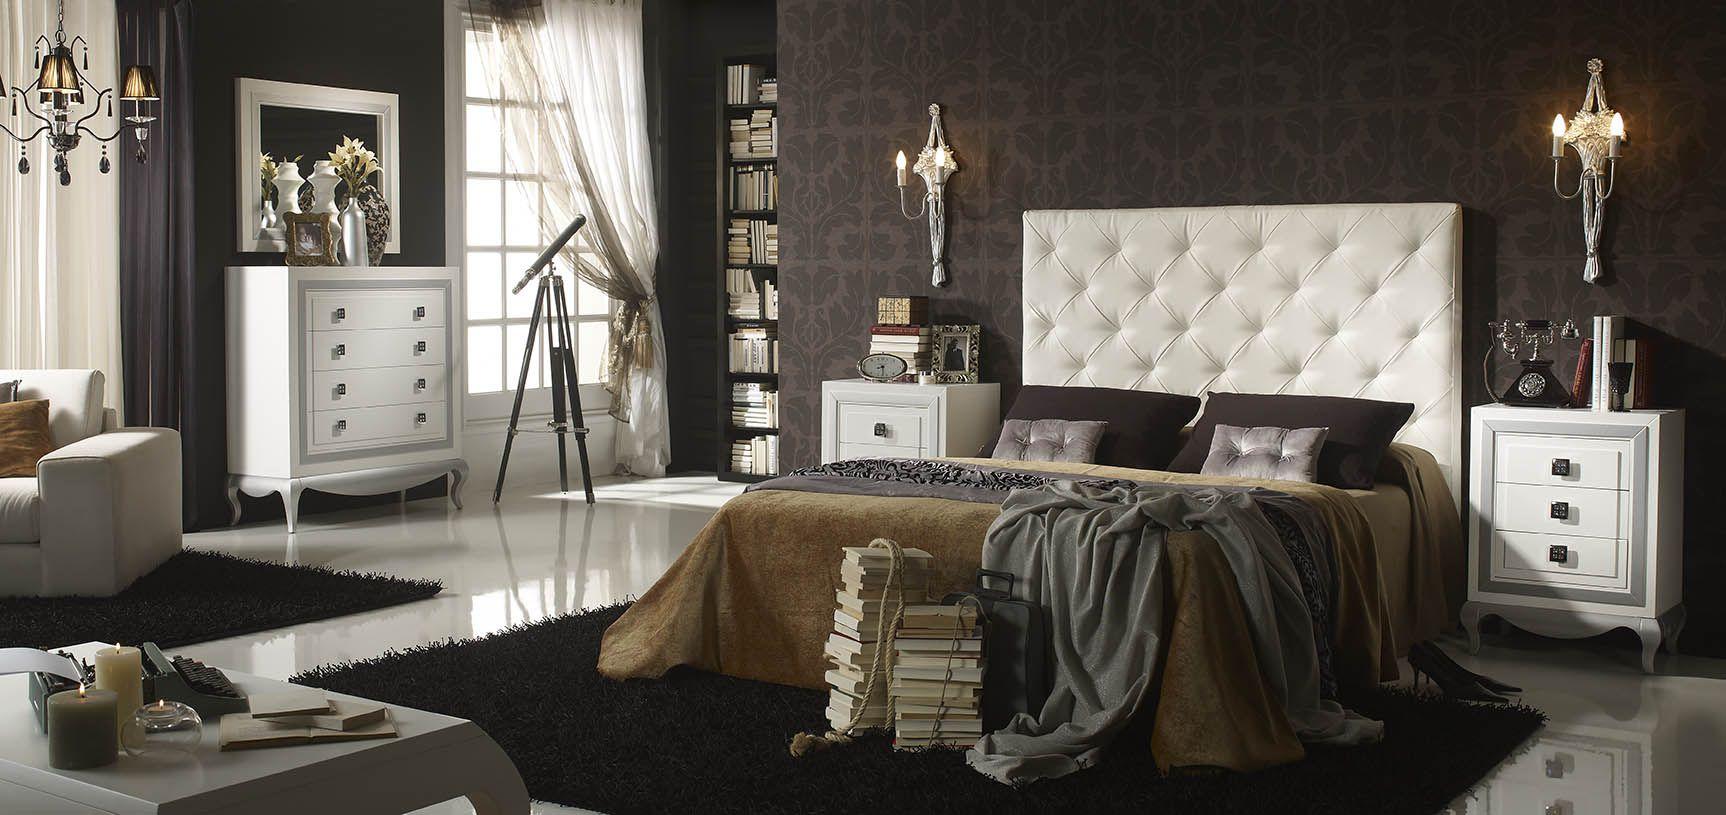 Matrimonio Bed Info : Dormitorio de matrimonio en madera maciza con cabecero